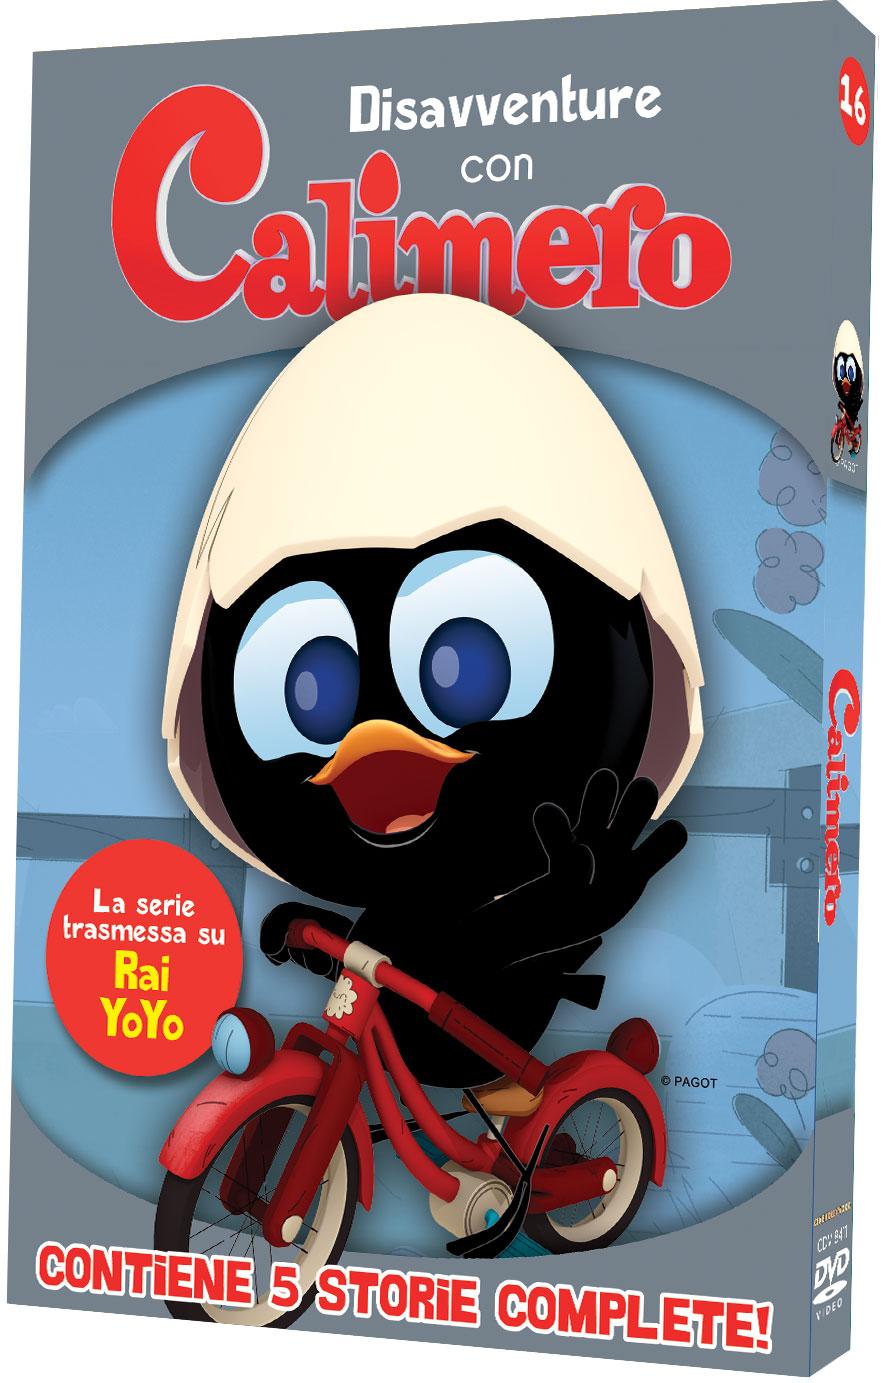 CALIMERO - DISAVVENTURE CON CALIMERO (DVD)